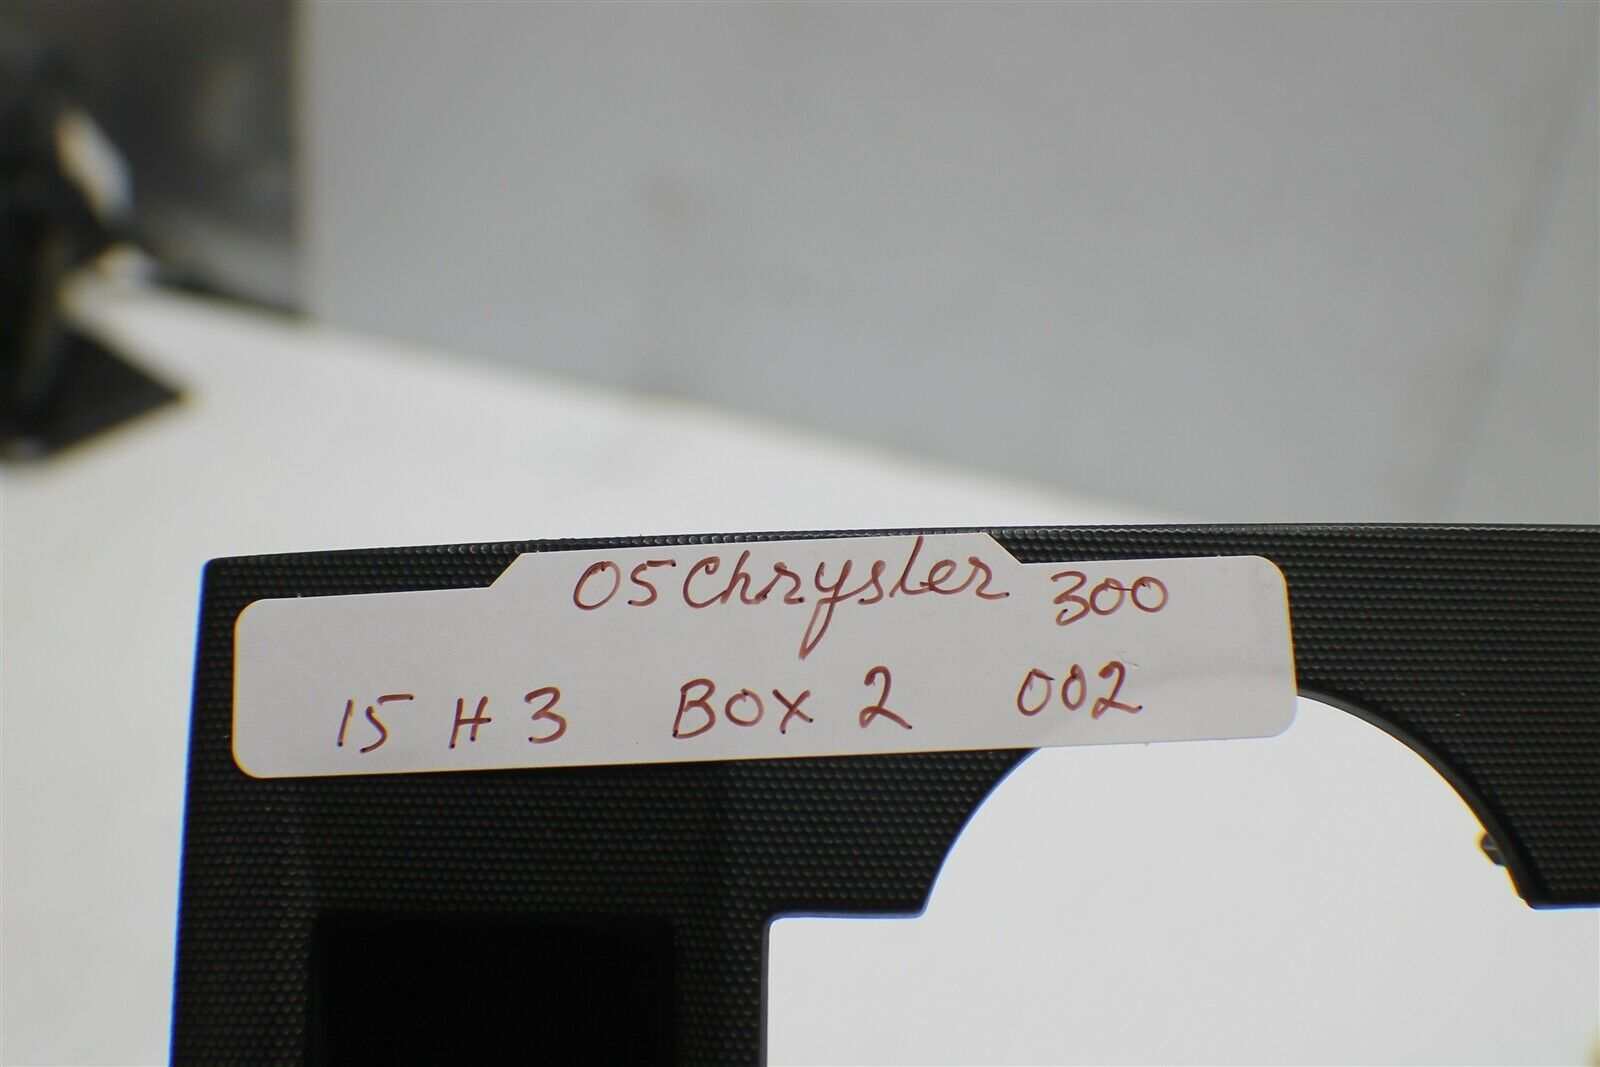 2007 Chrysler 300 Center Dash Radio Trim Bezel Clock Vents 1087510 2 02 15H3